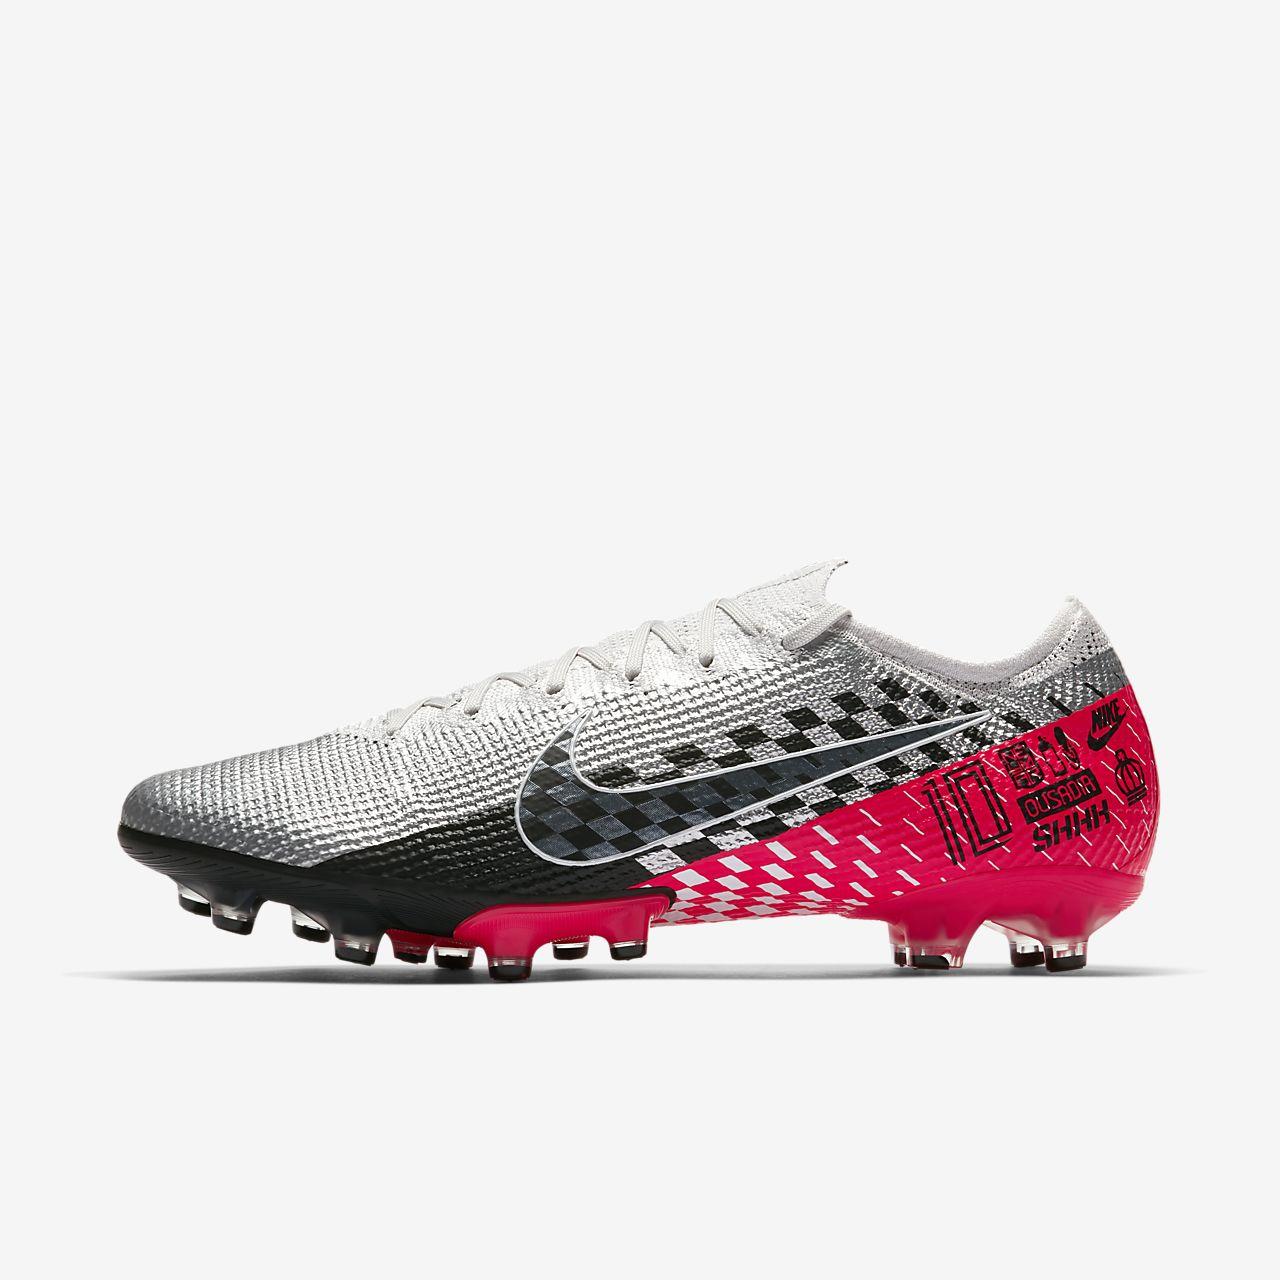 Scarpa da calcio per erba artificiale Nike Mercurial Vapor 13 Elite Neymar Jr. AG PRO